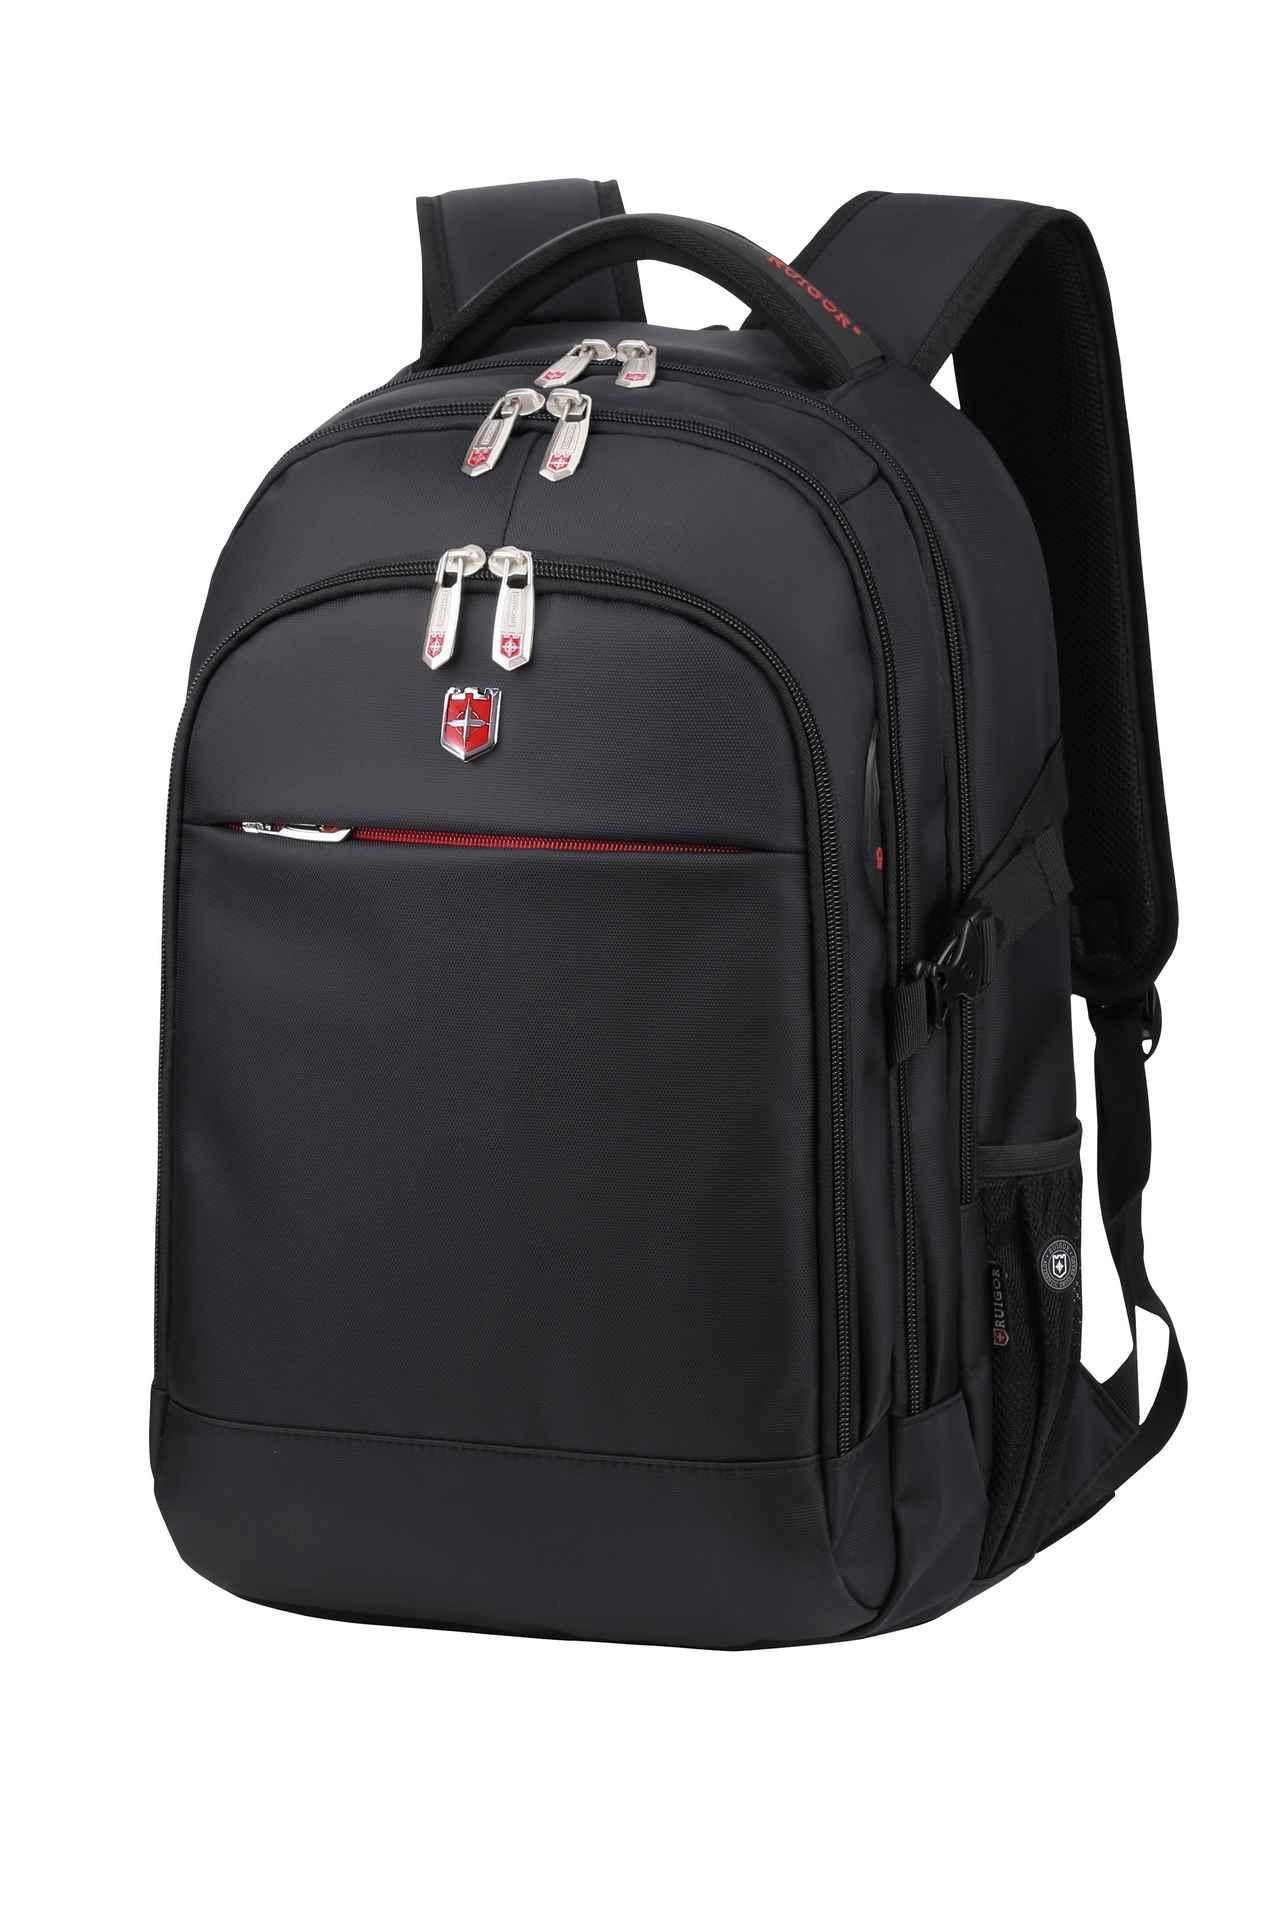 RUIGOR ICON 92 Laptop Backpack Black